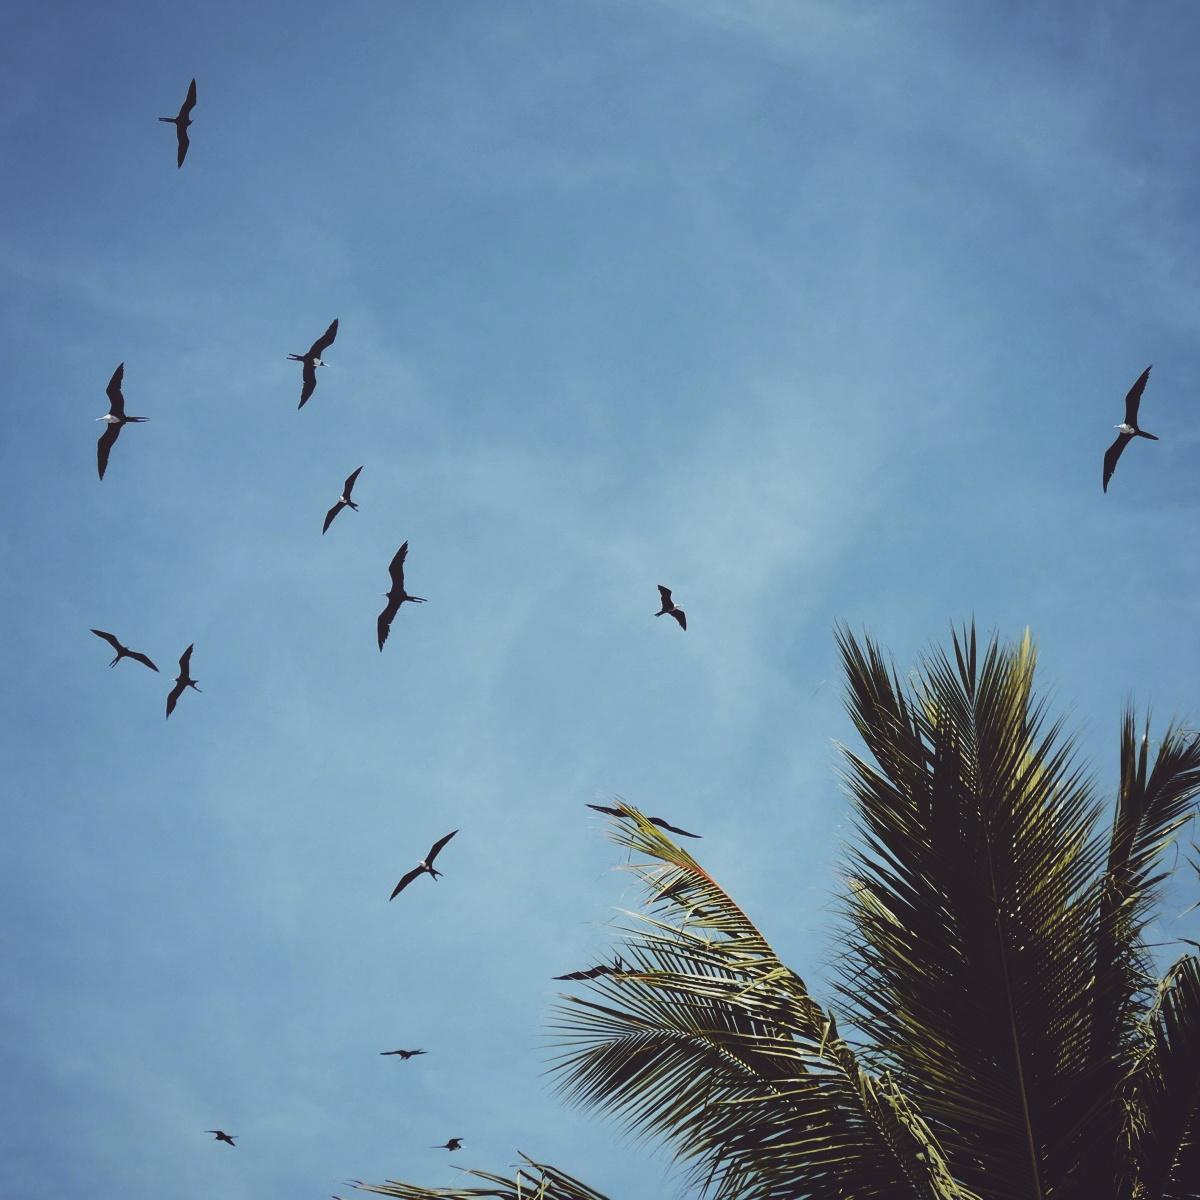 Magnificent Frigatebirds circle above a palm tree in San Blas. Noah Strycker